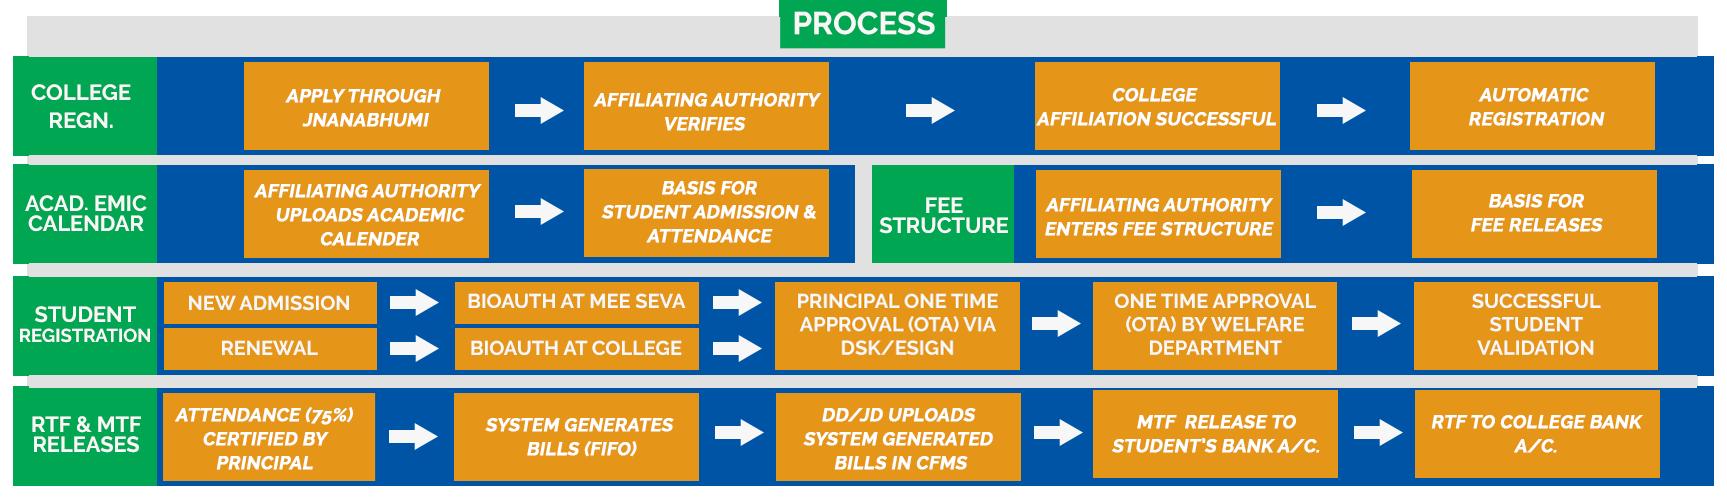 Jnanahumi PMS Scholarship Process Flowchart